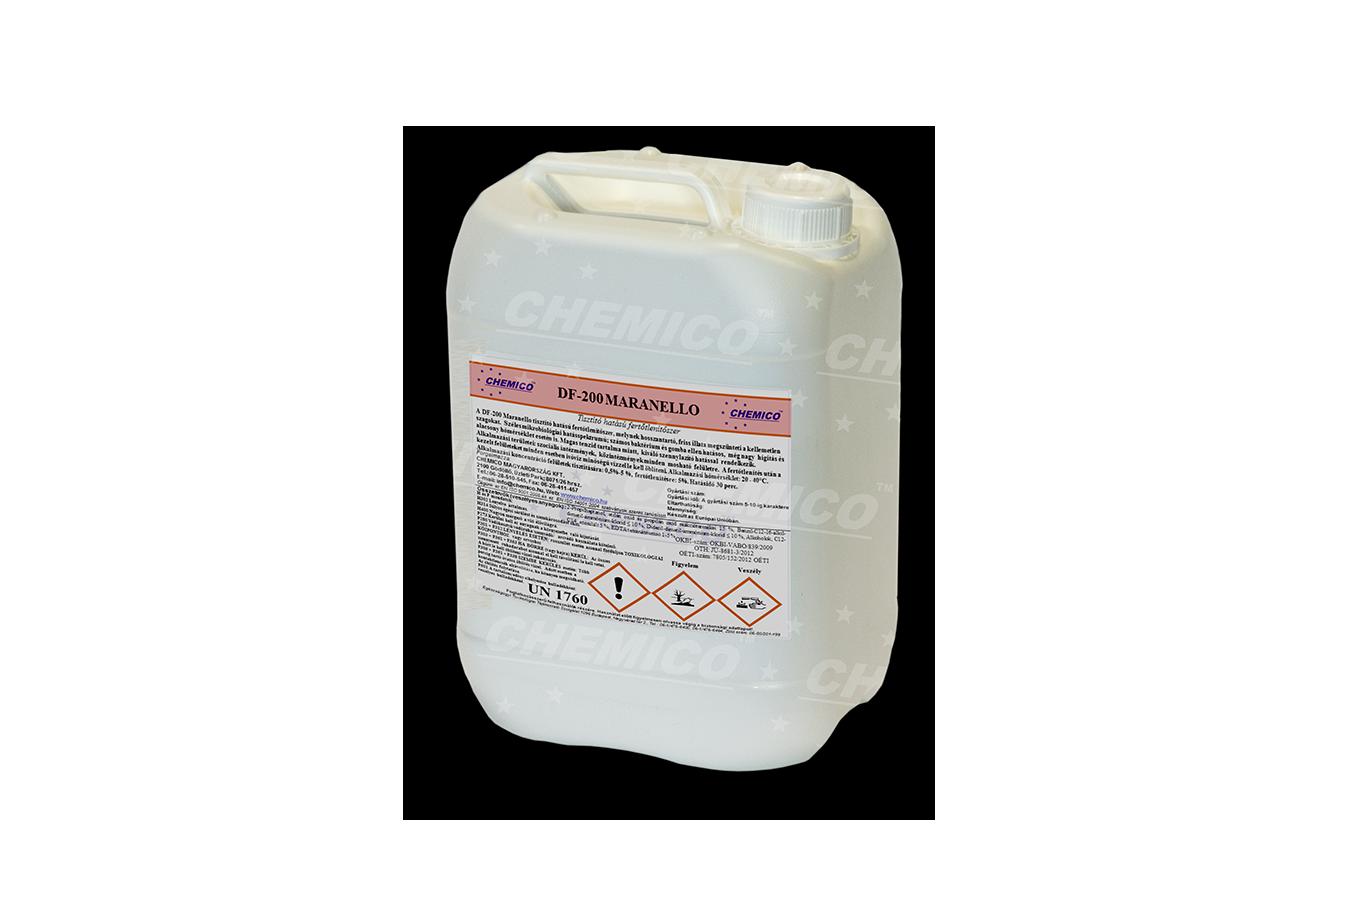 df-200-maranello-fertotlenito-tisztito-semleges-ipari-illatos-chemico-5l